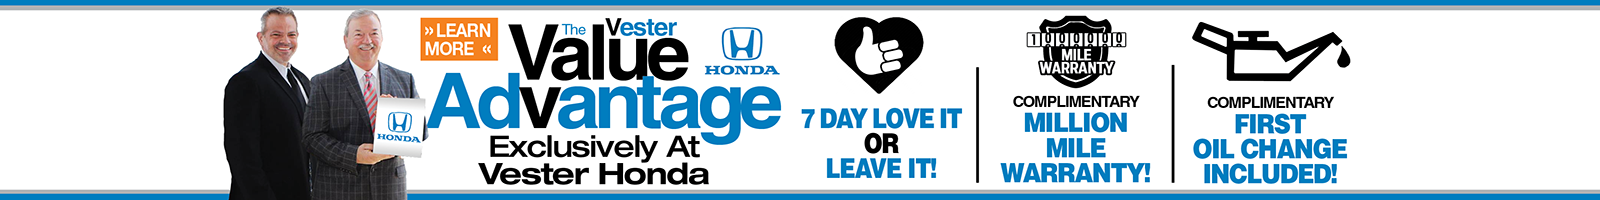 Value Advantage Honda